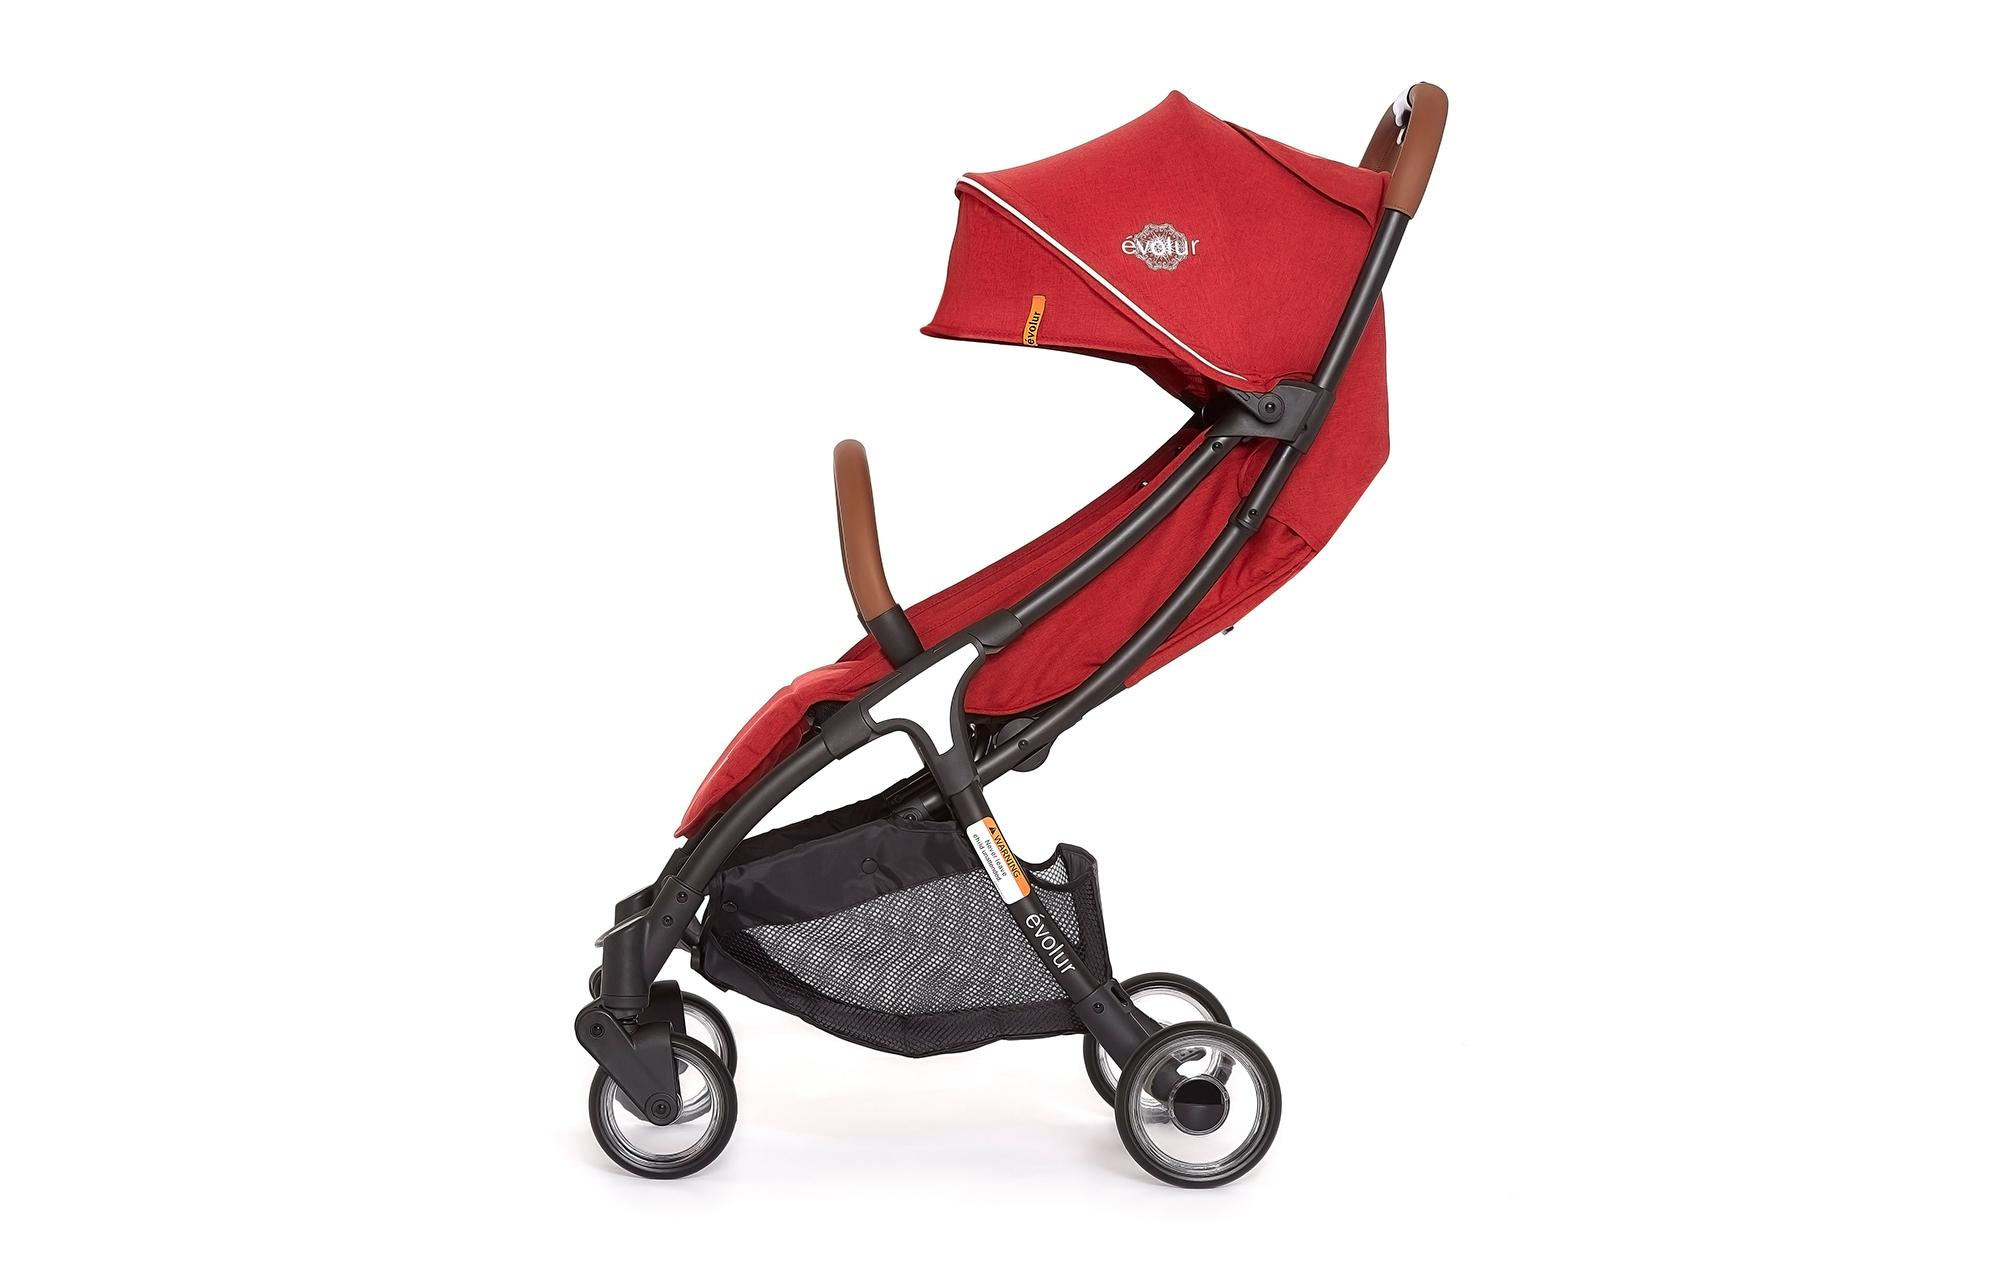 Evolur Vogue Stroller Red 04